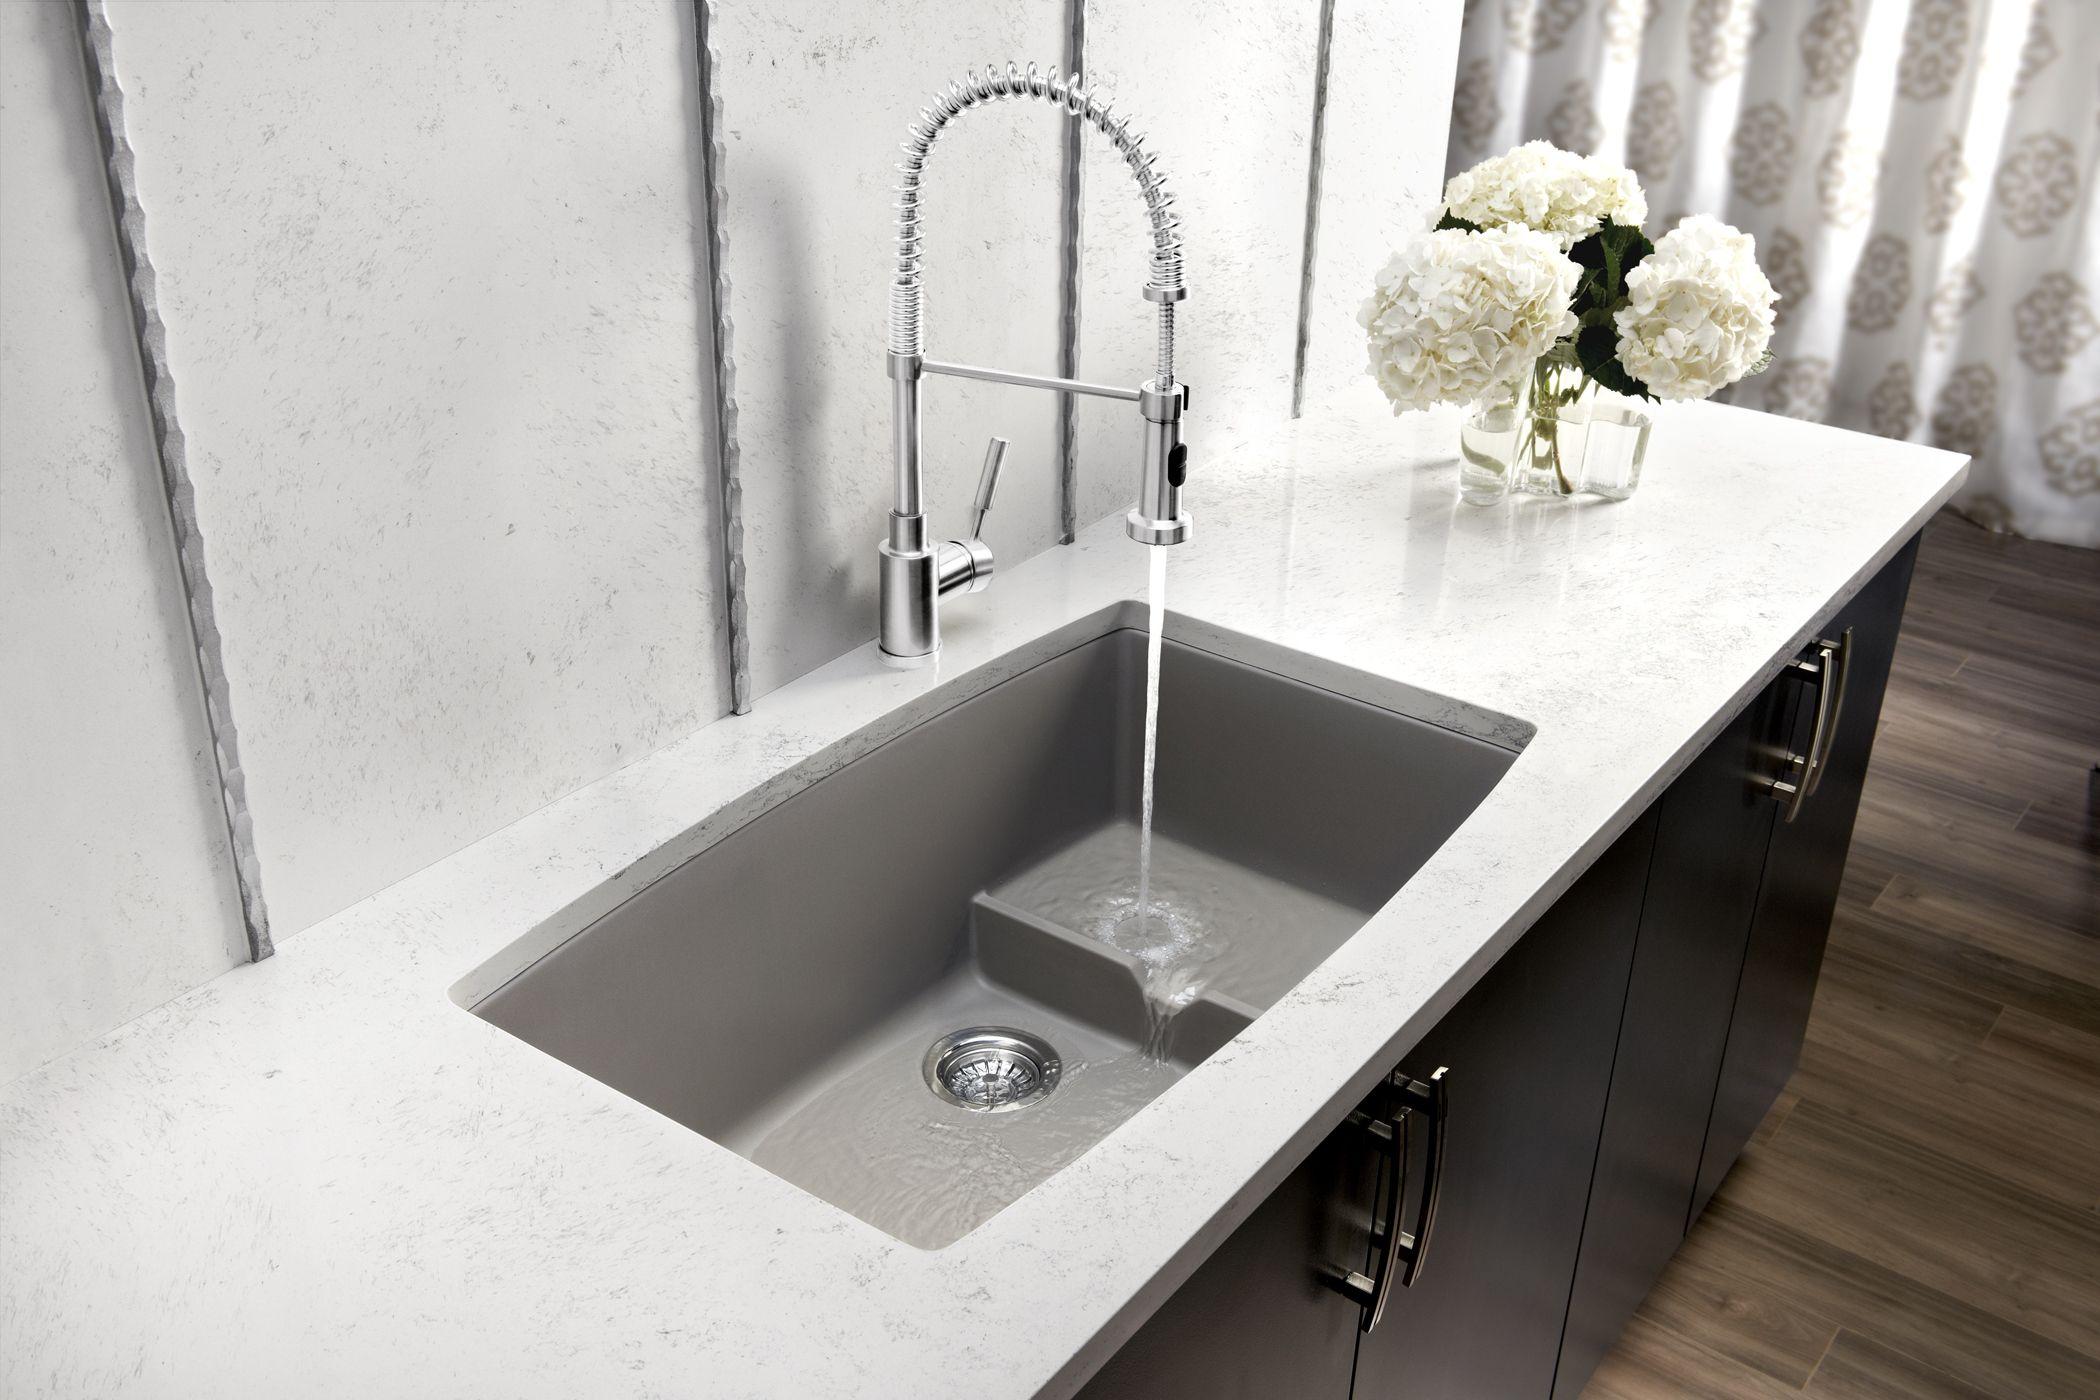 Blanco Etagon Silgranit sink with Blanco Culina Mini-S tap & soap dispenser  fitted into